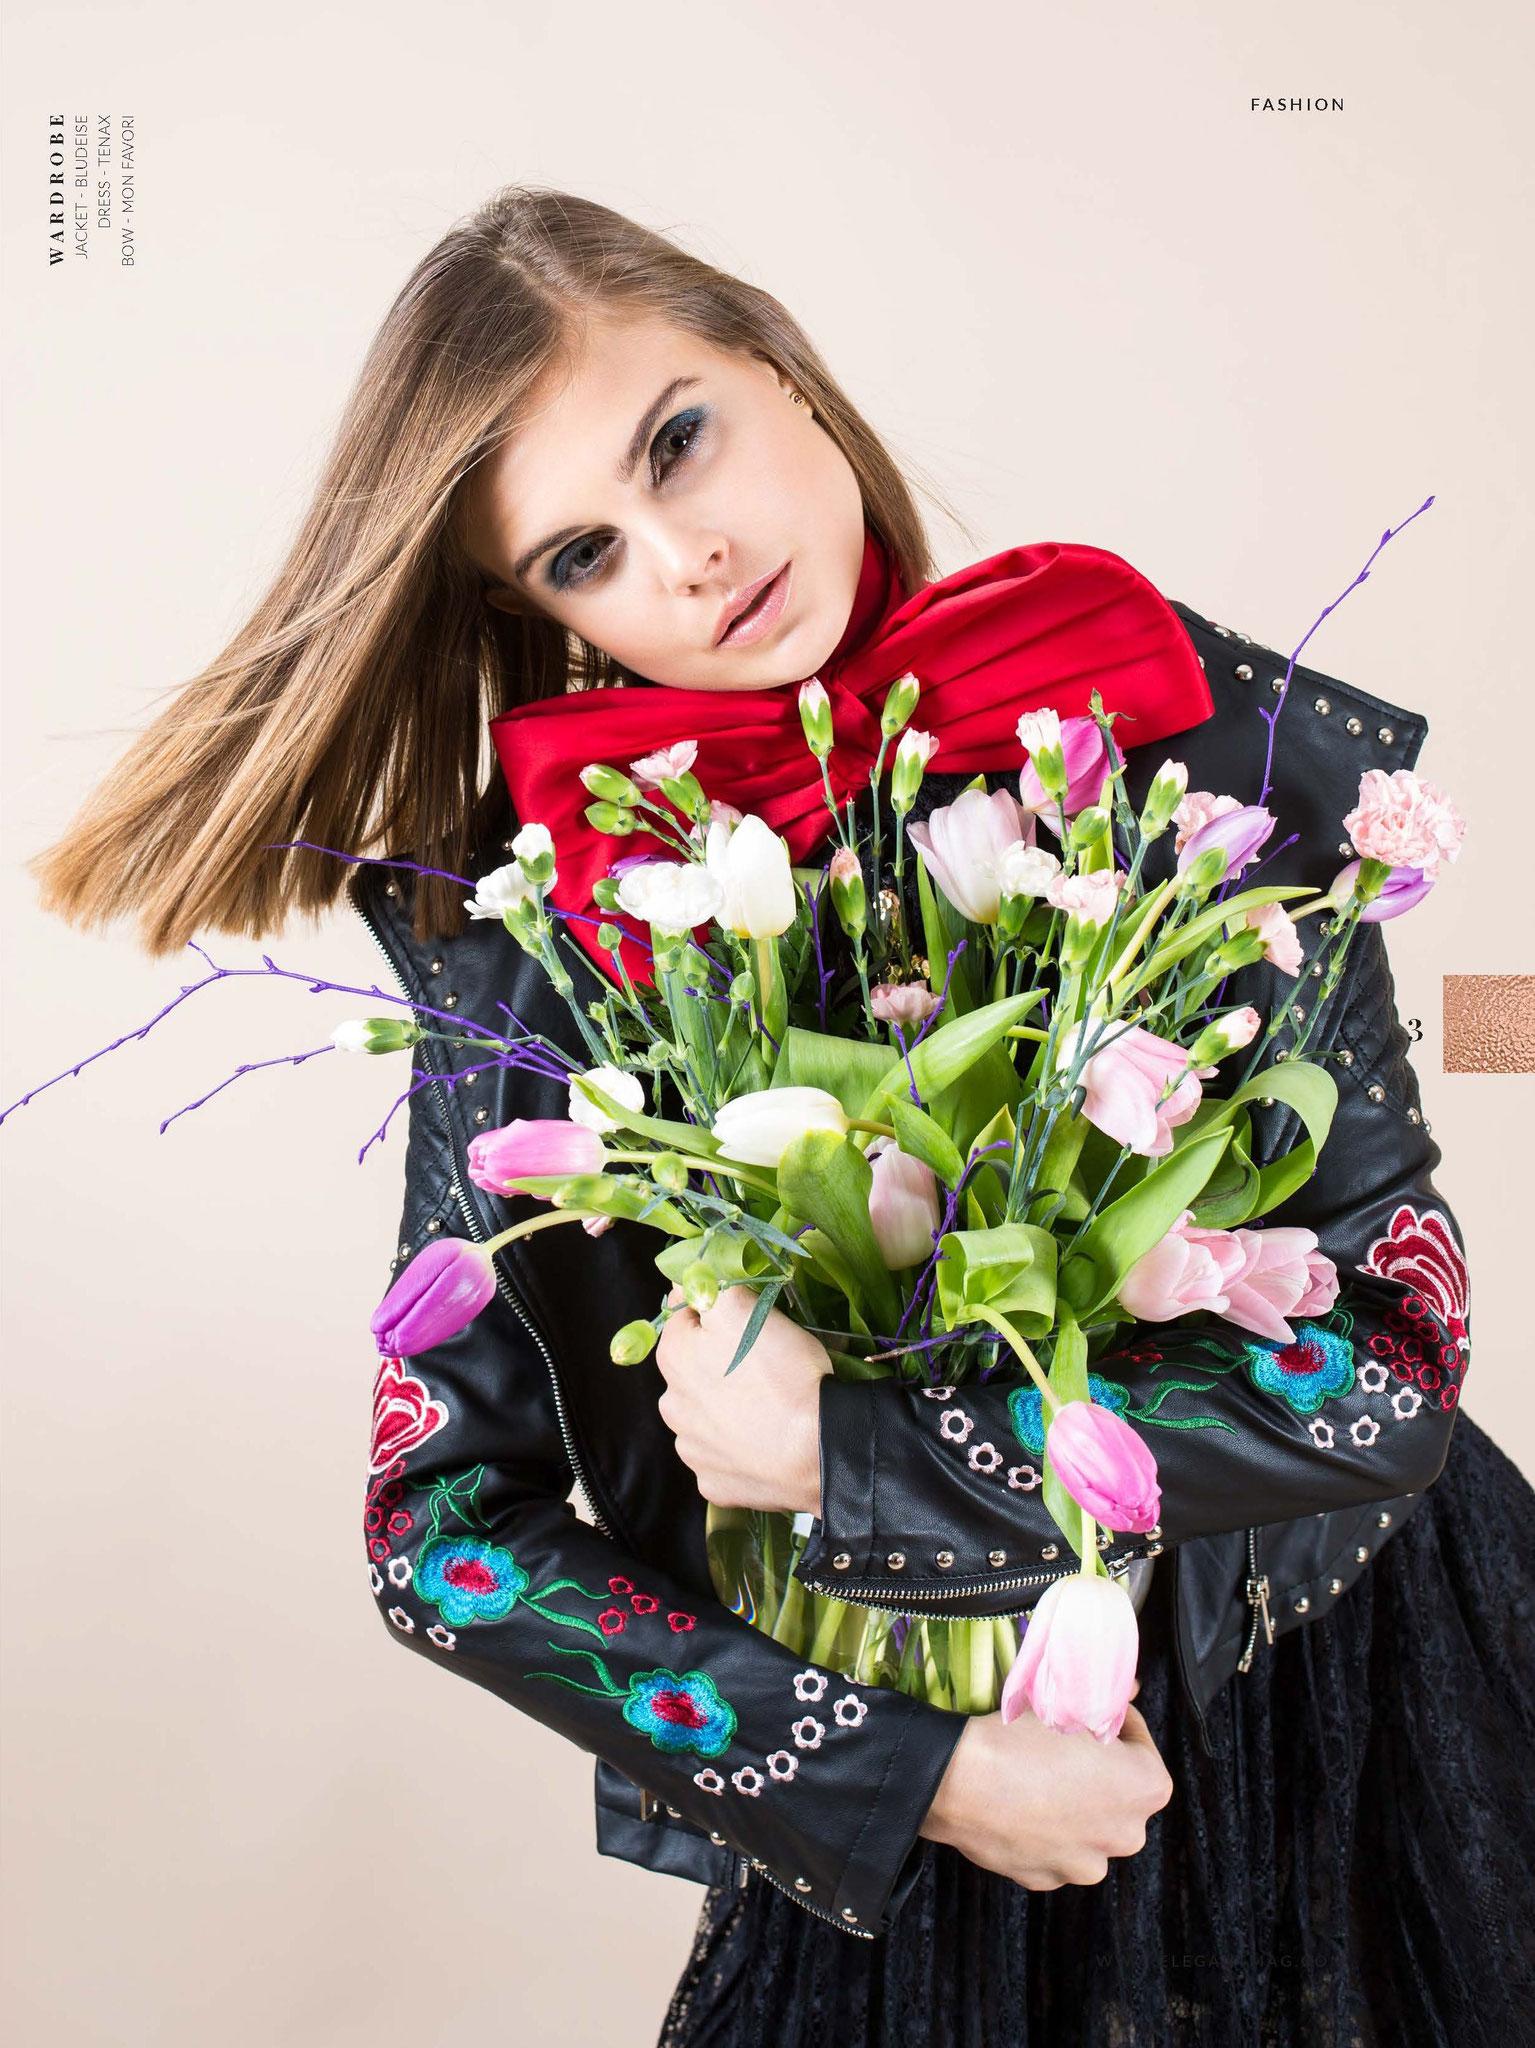 Flower Fantasies - ELEGANT NYC, April 2018 Vol. 47 No. 13